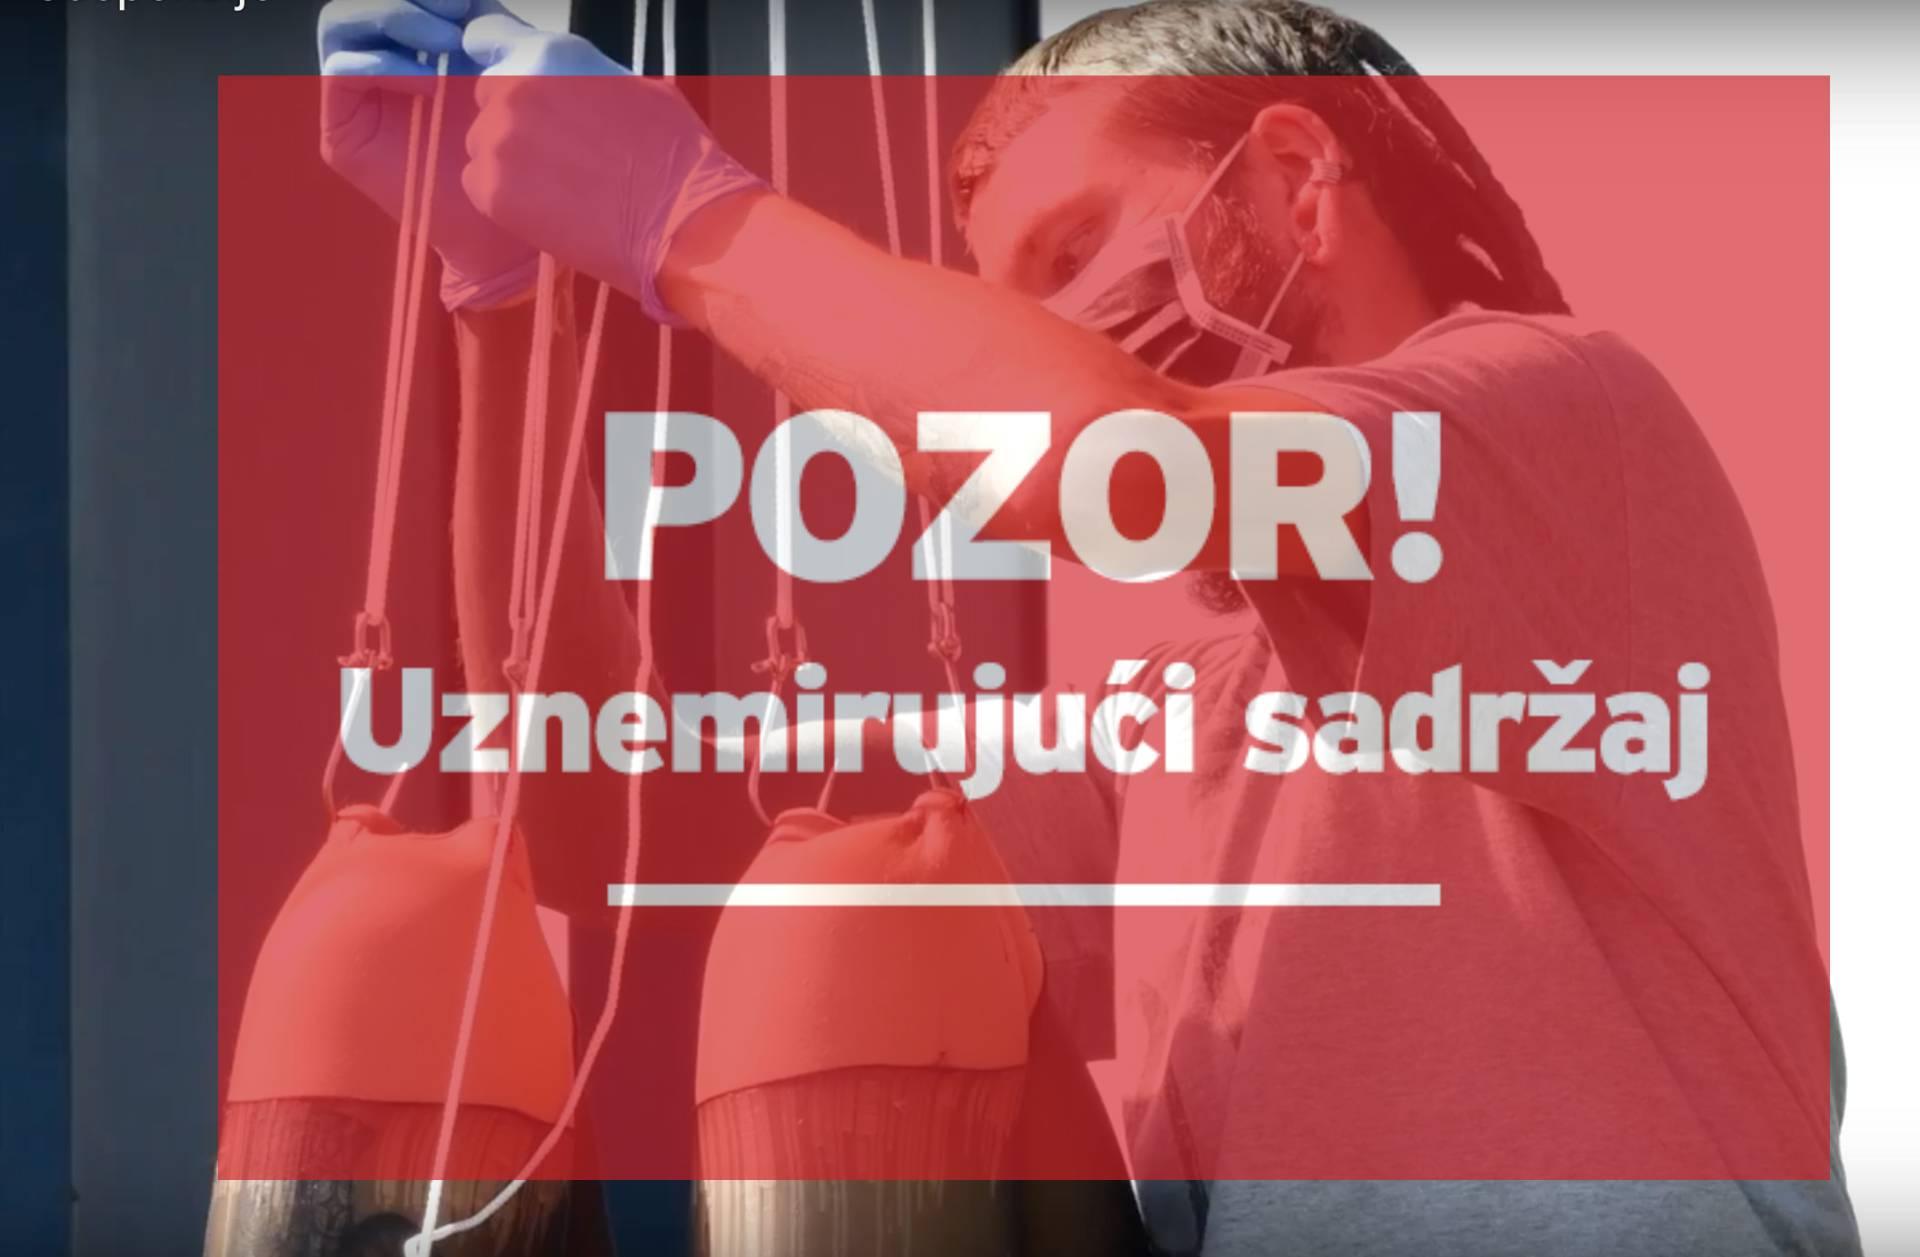 Ekskluzivne snimke: U Zagrebu izveden prastari duhovni ritual